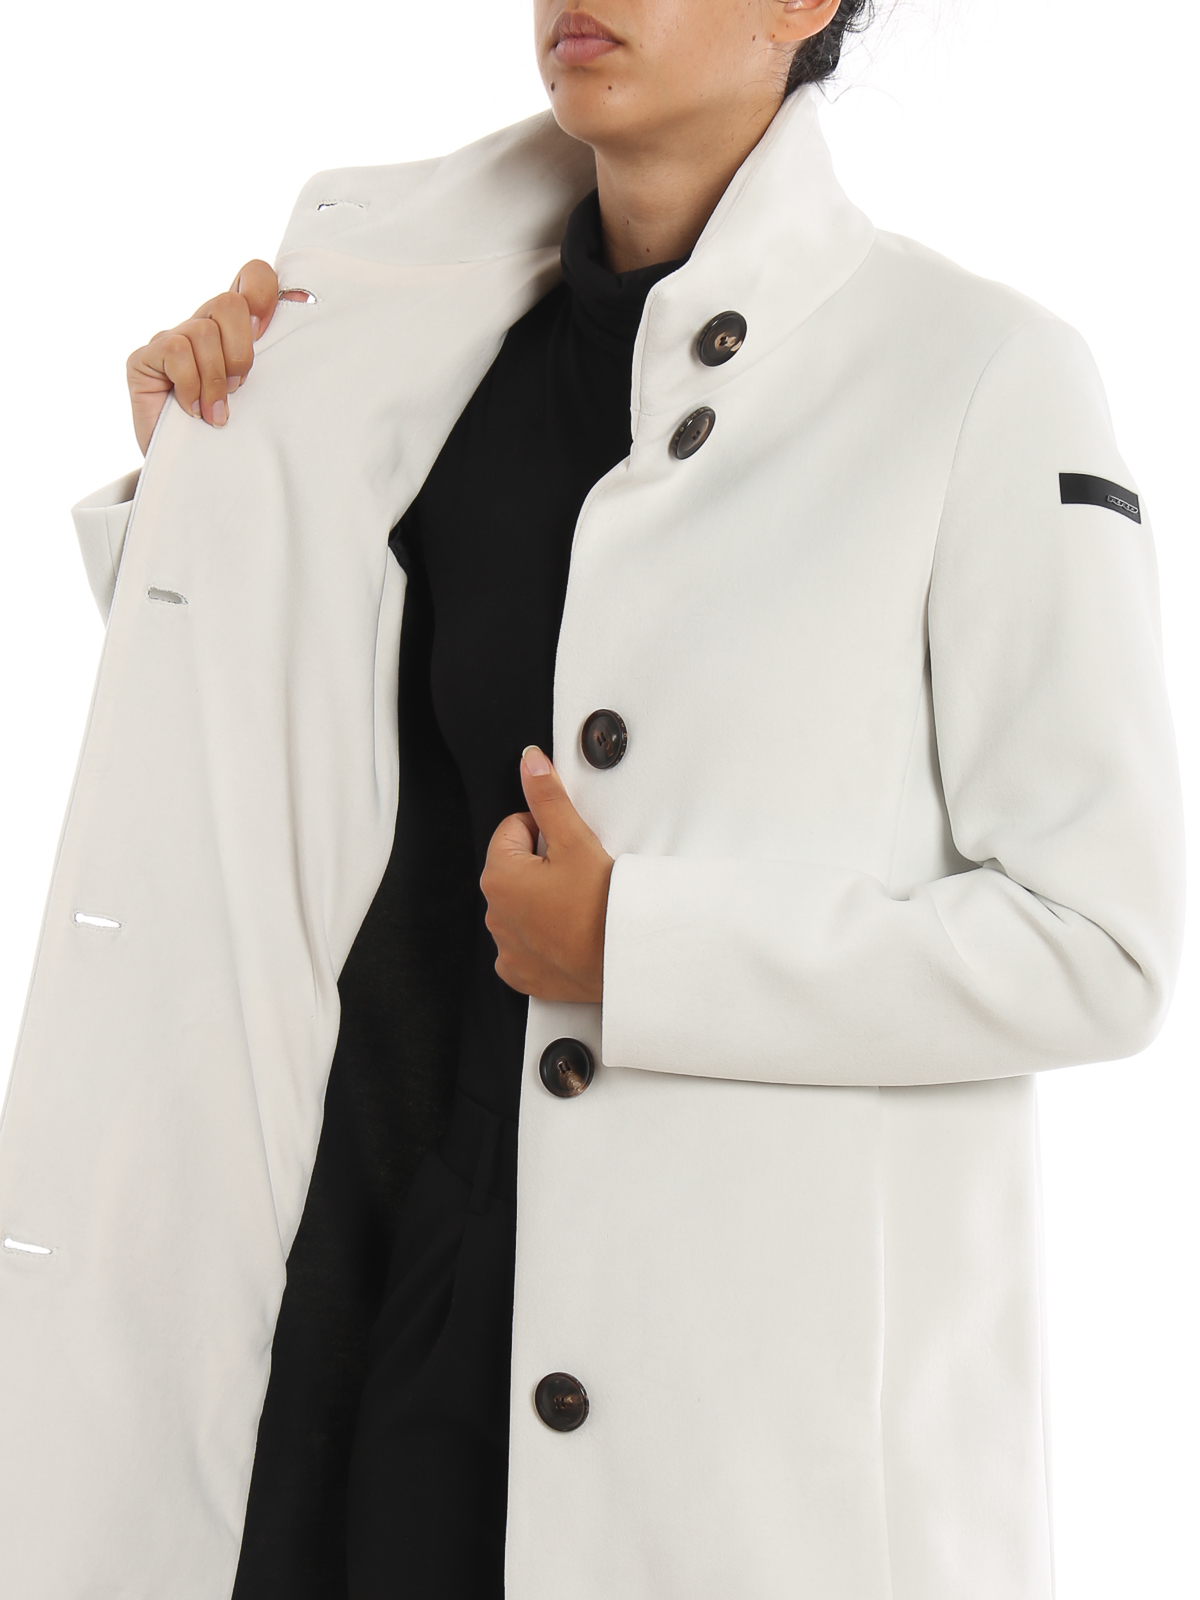 Großhändler 3001f 4d3df rrd mantel damen refugium